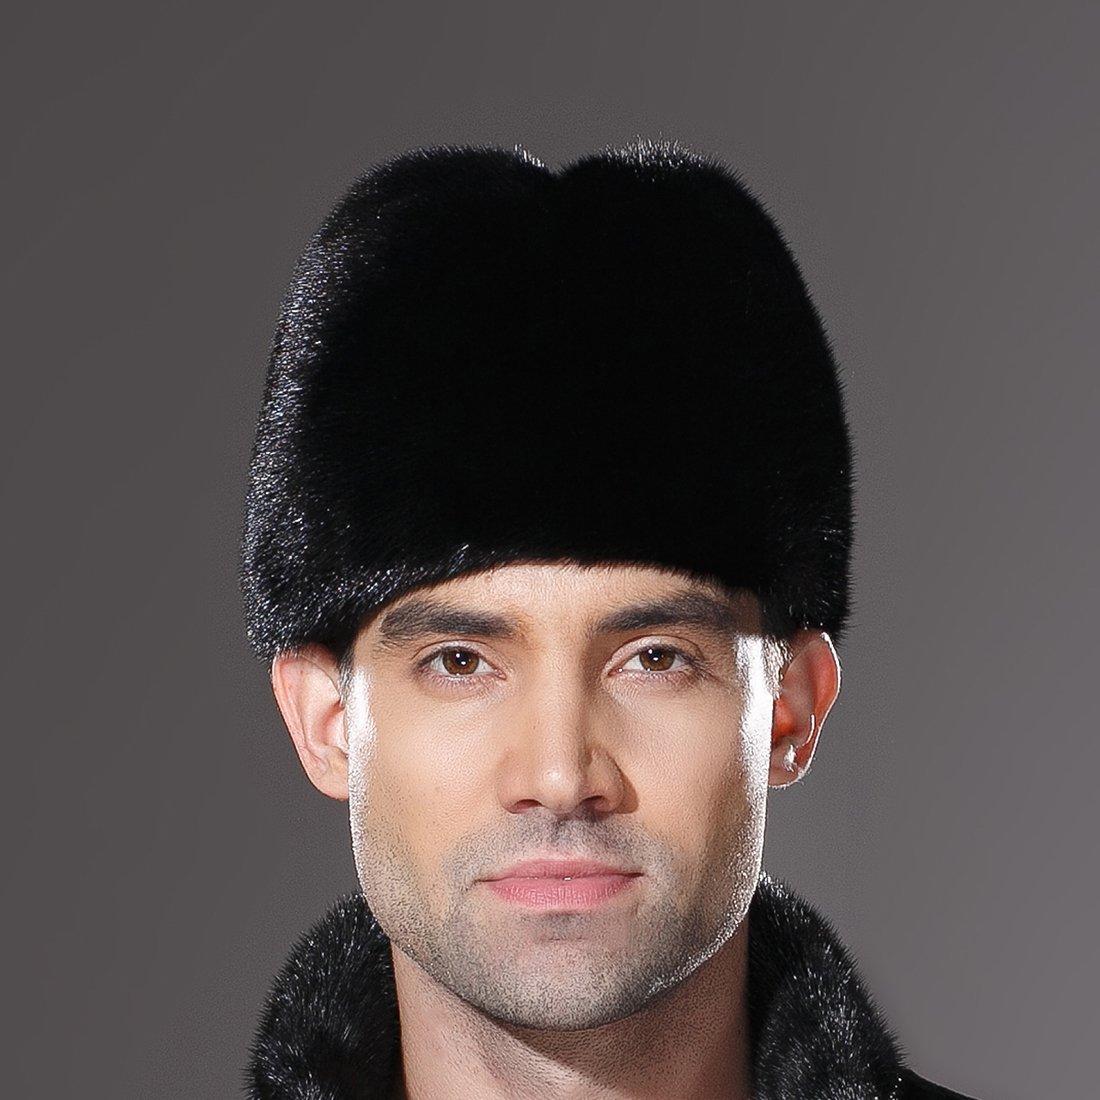 URSFUR Mens Winter Russian Cossack Hat Real Mink Fur Cap Black by URSFUR (Image #8)